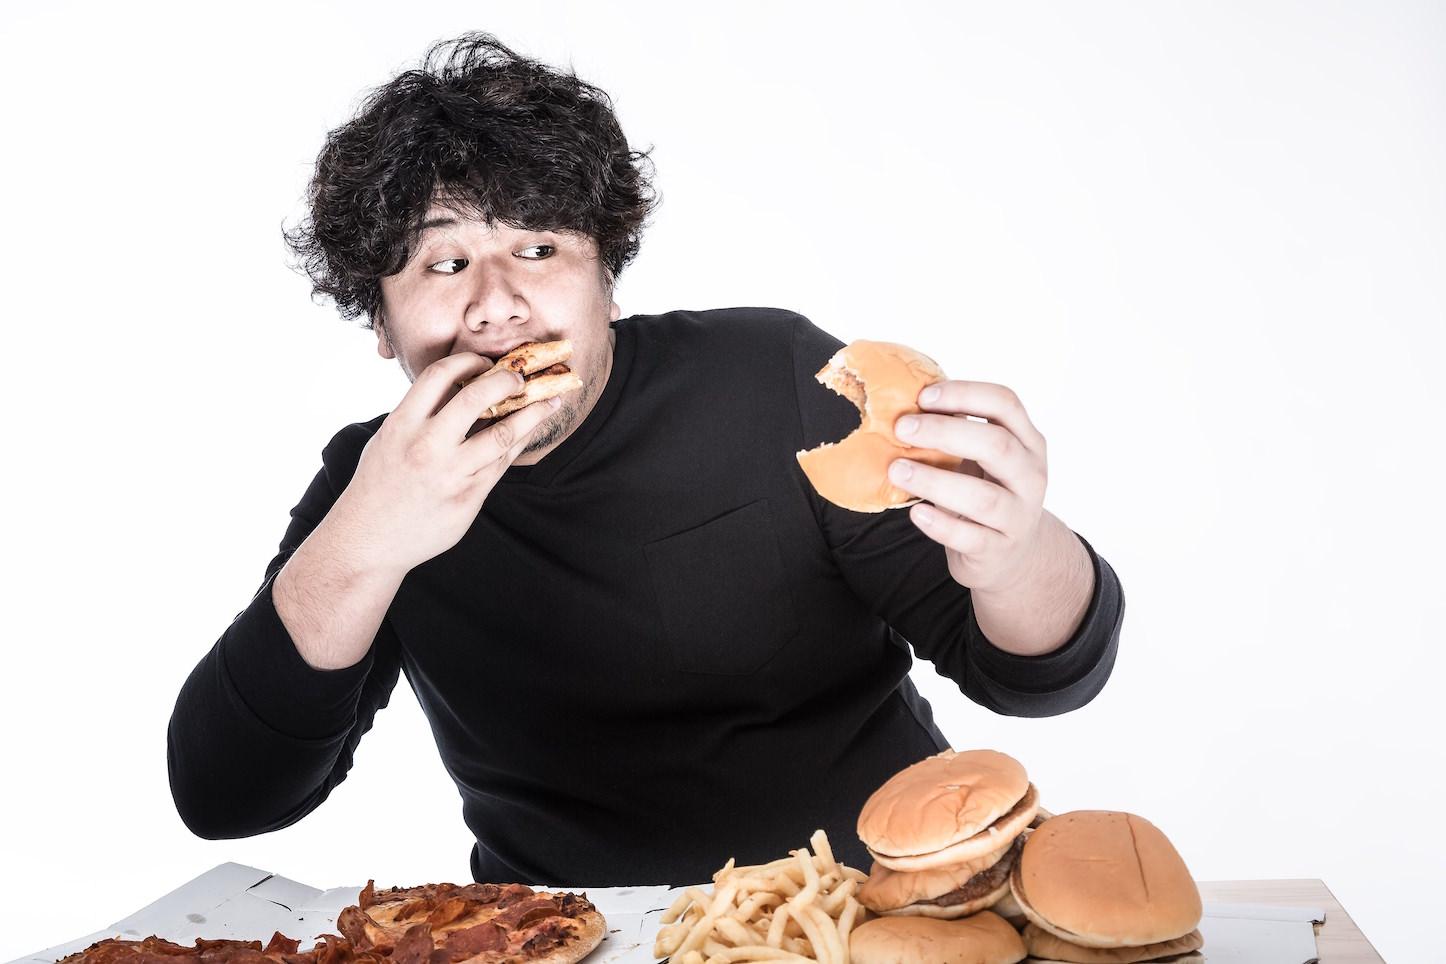 kuchiki-eating-mcdonalds.jpg